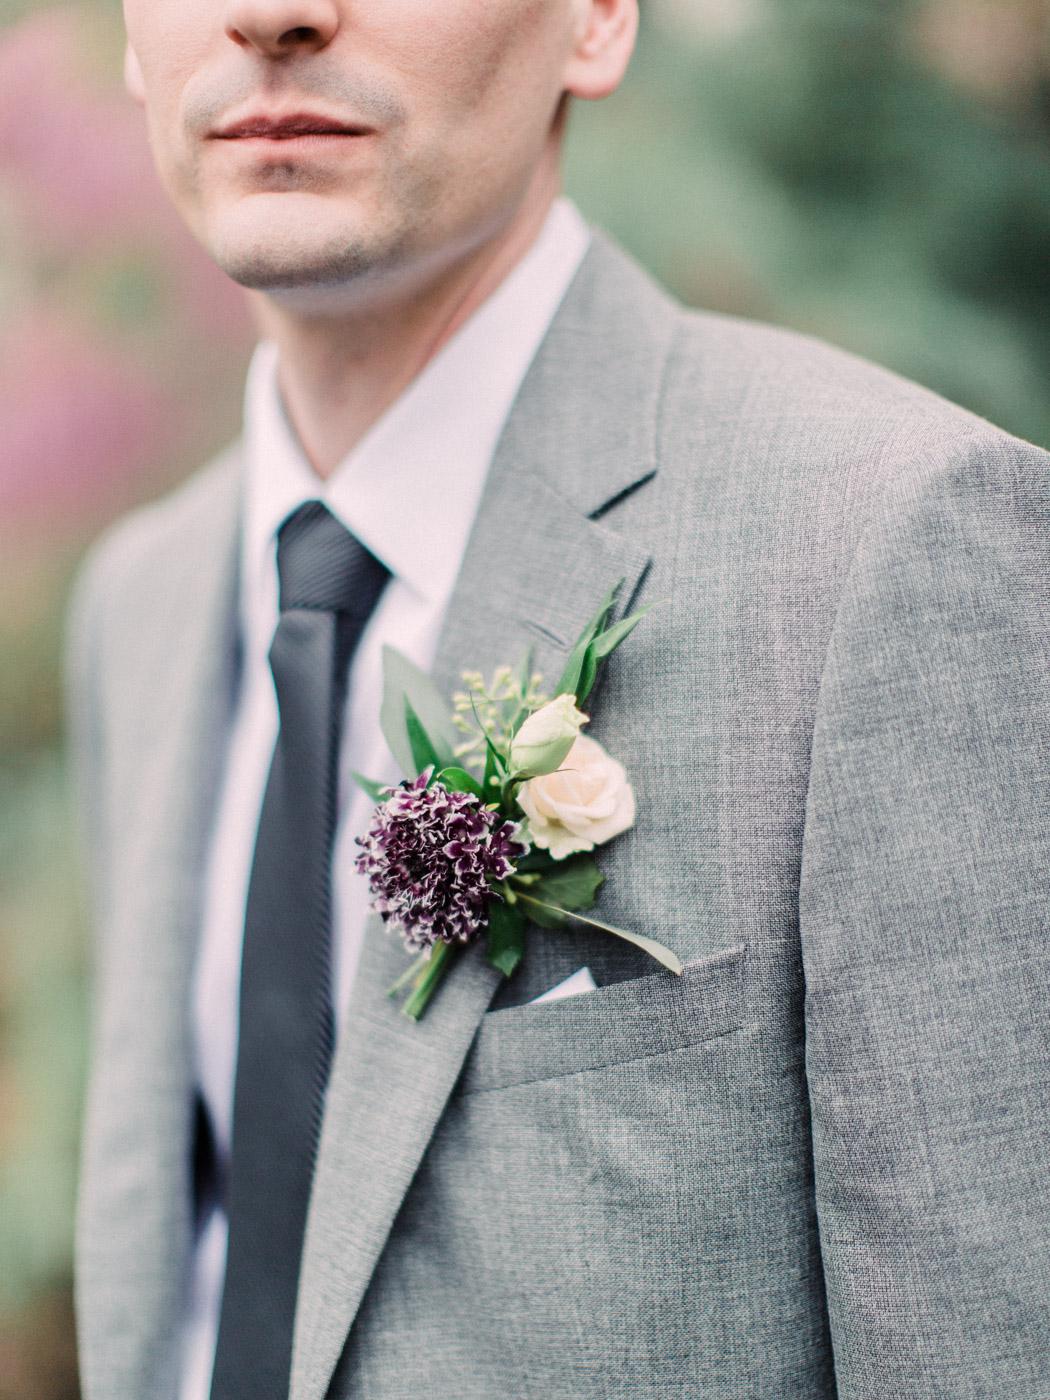 Toronto-wedding-photographer-intimate-classic-fine-art-elopement-ottawa50.jpg